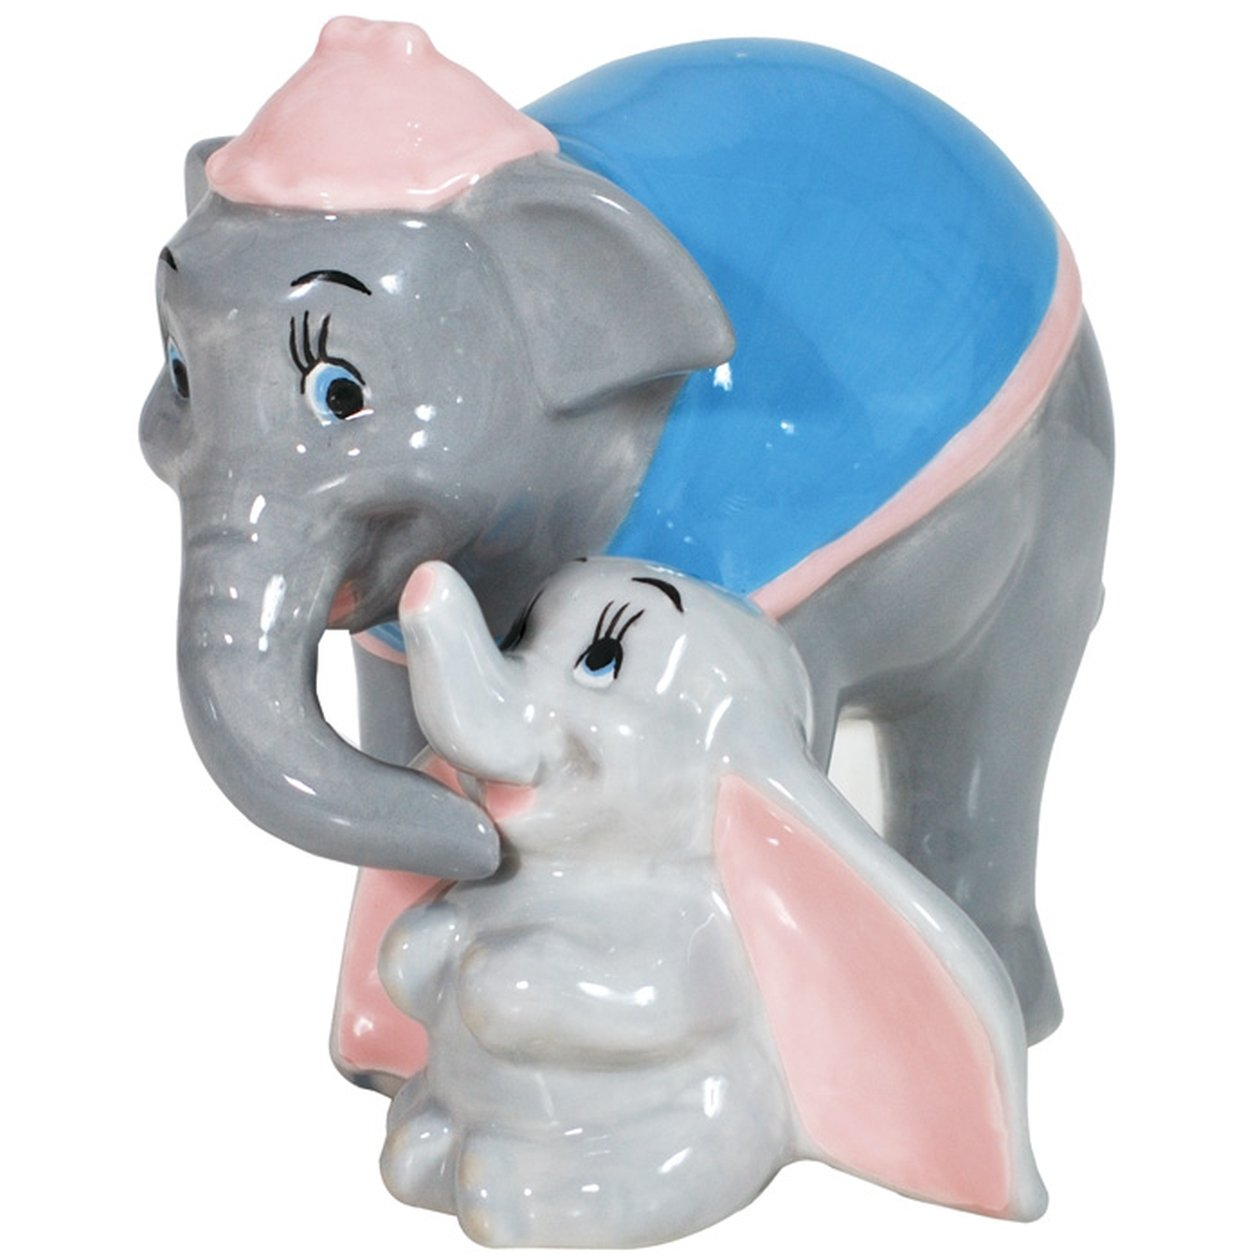 Westland Giftware Magnetic Ceramic Salt and Pepper Shaker Set, 3.25-Inch, Disney Motherly Love SS-WL-25702